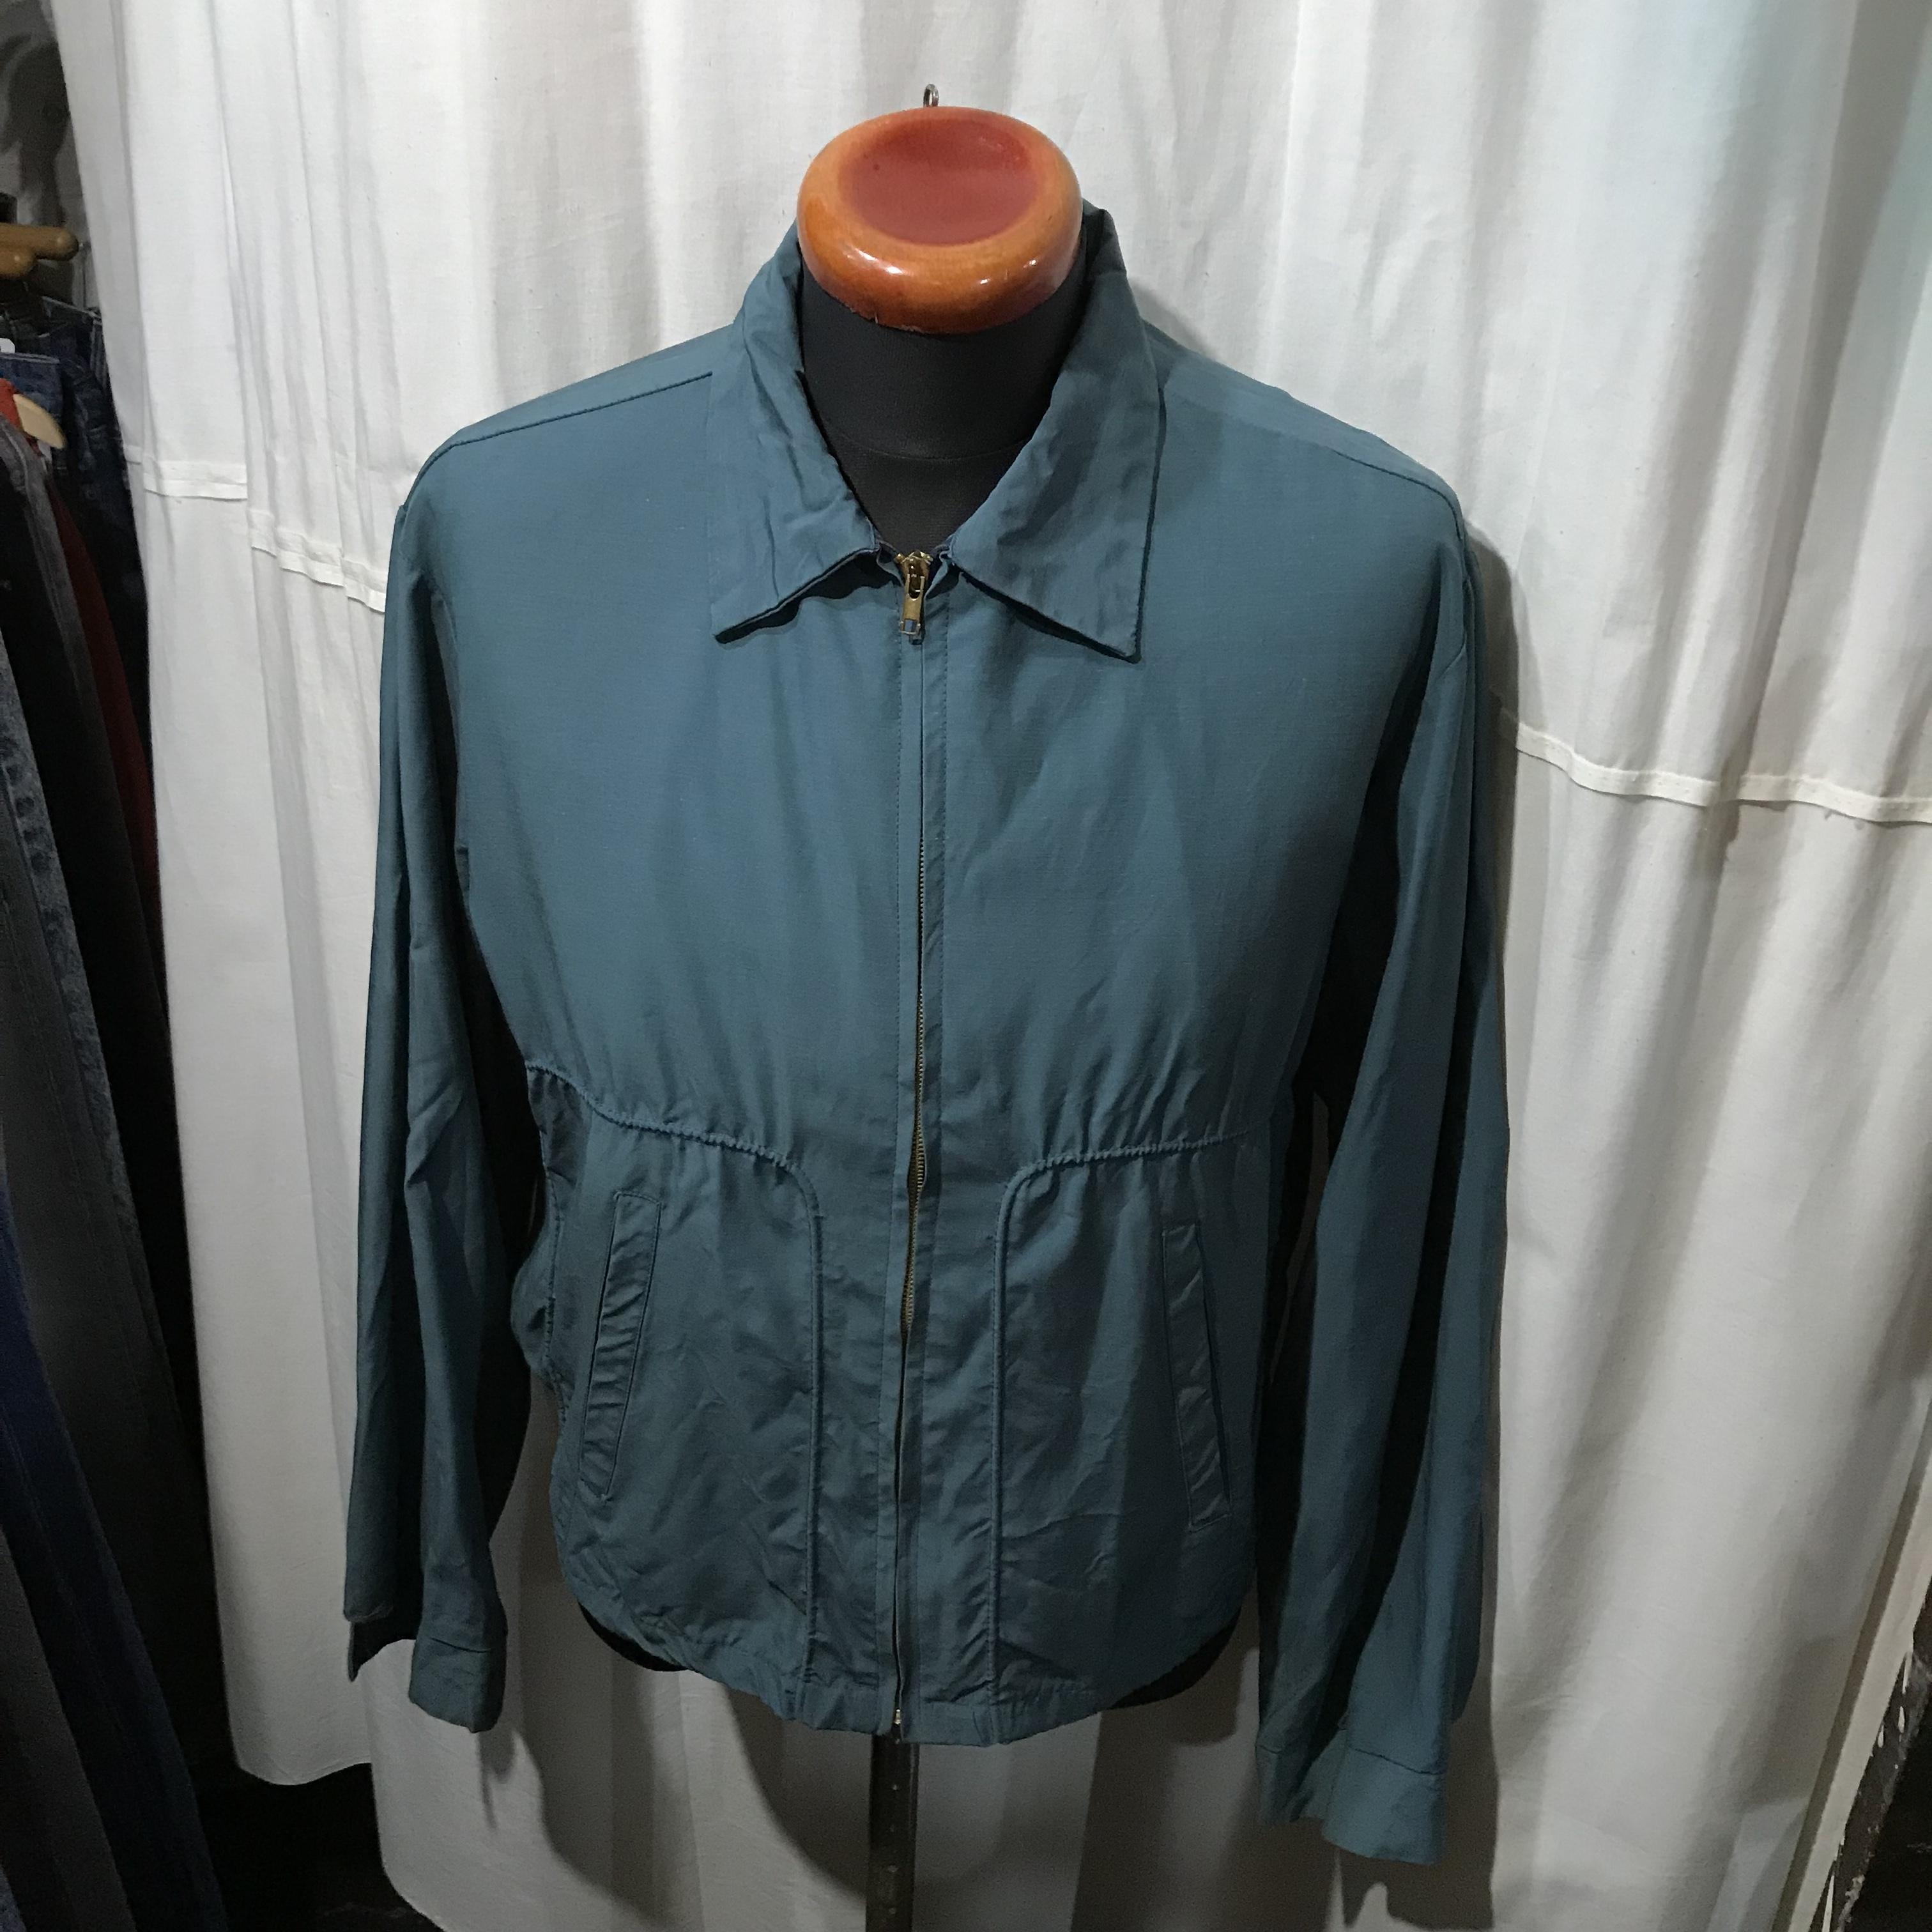 50's~60's vintage Sportswear スポーツウェア スイングトップジャケット メンズL